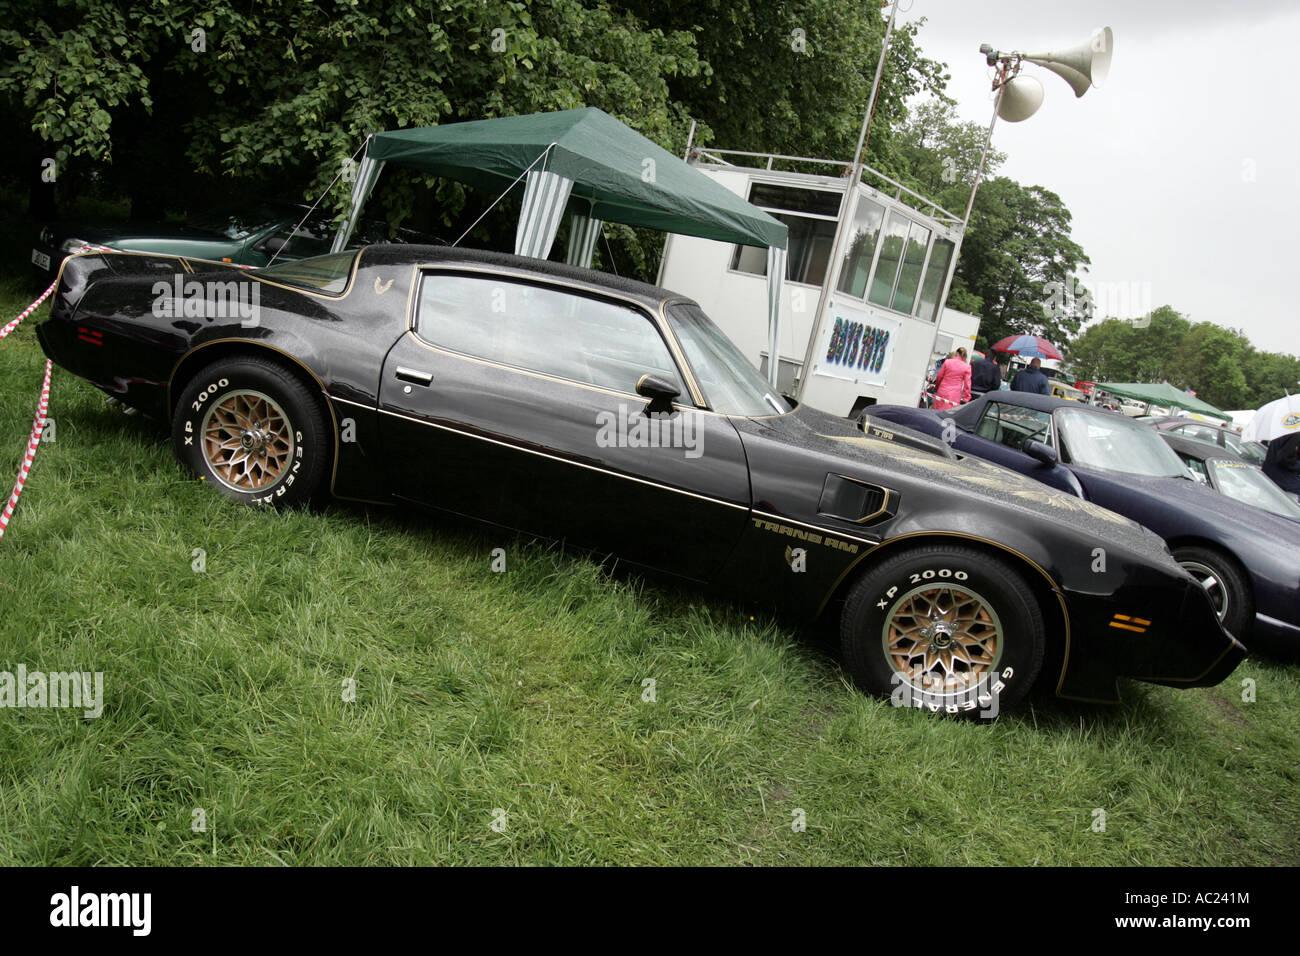 old sport car Stock Photo: 13015759 - Alamy